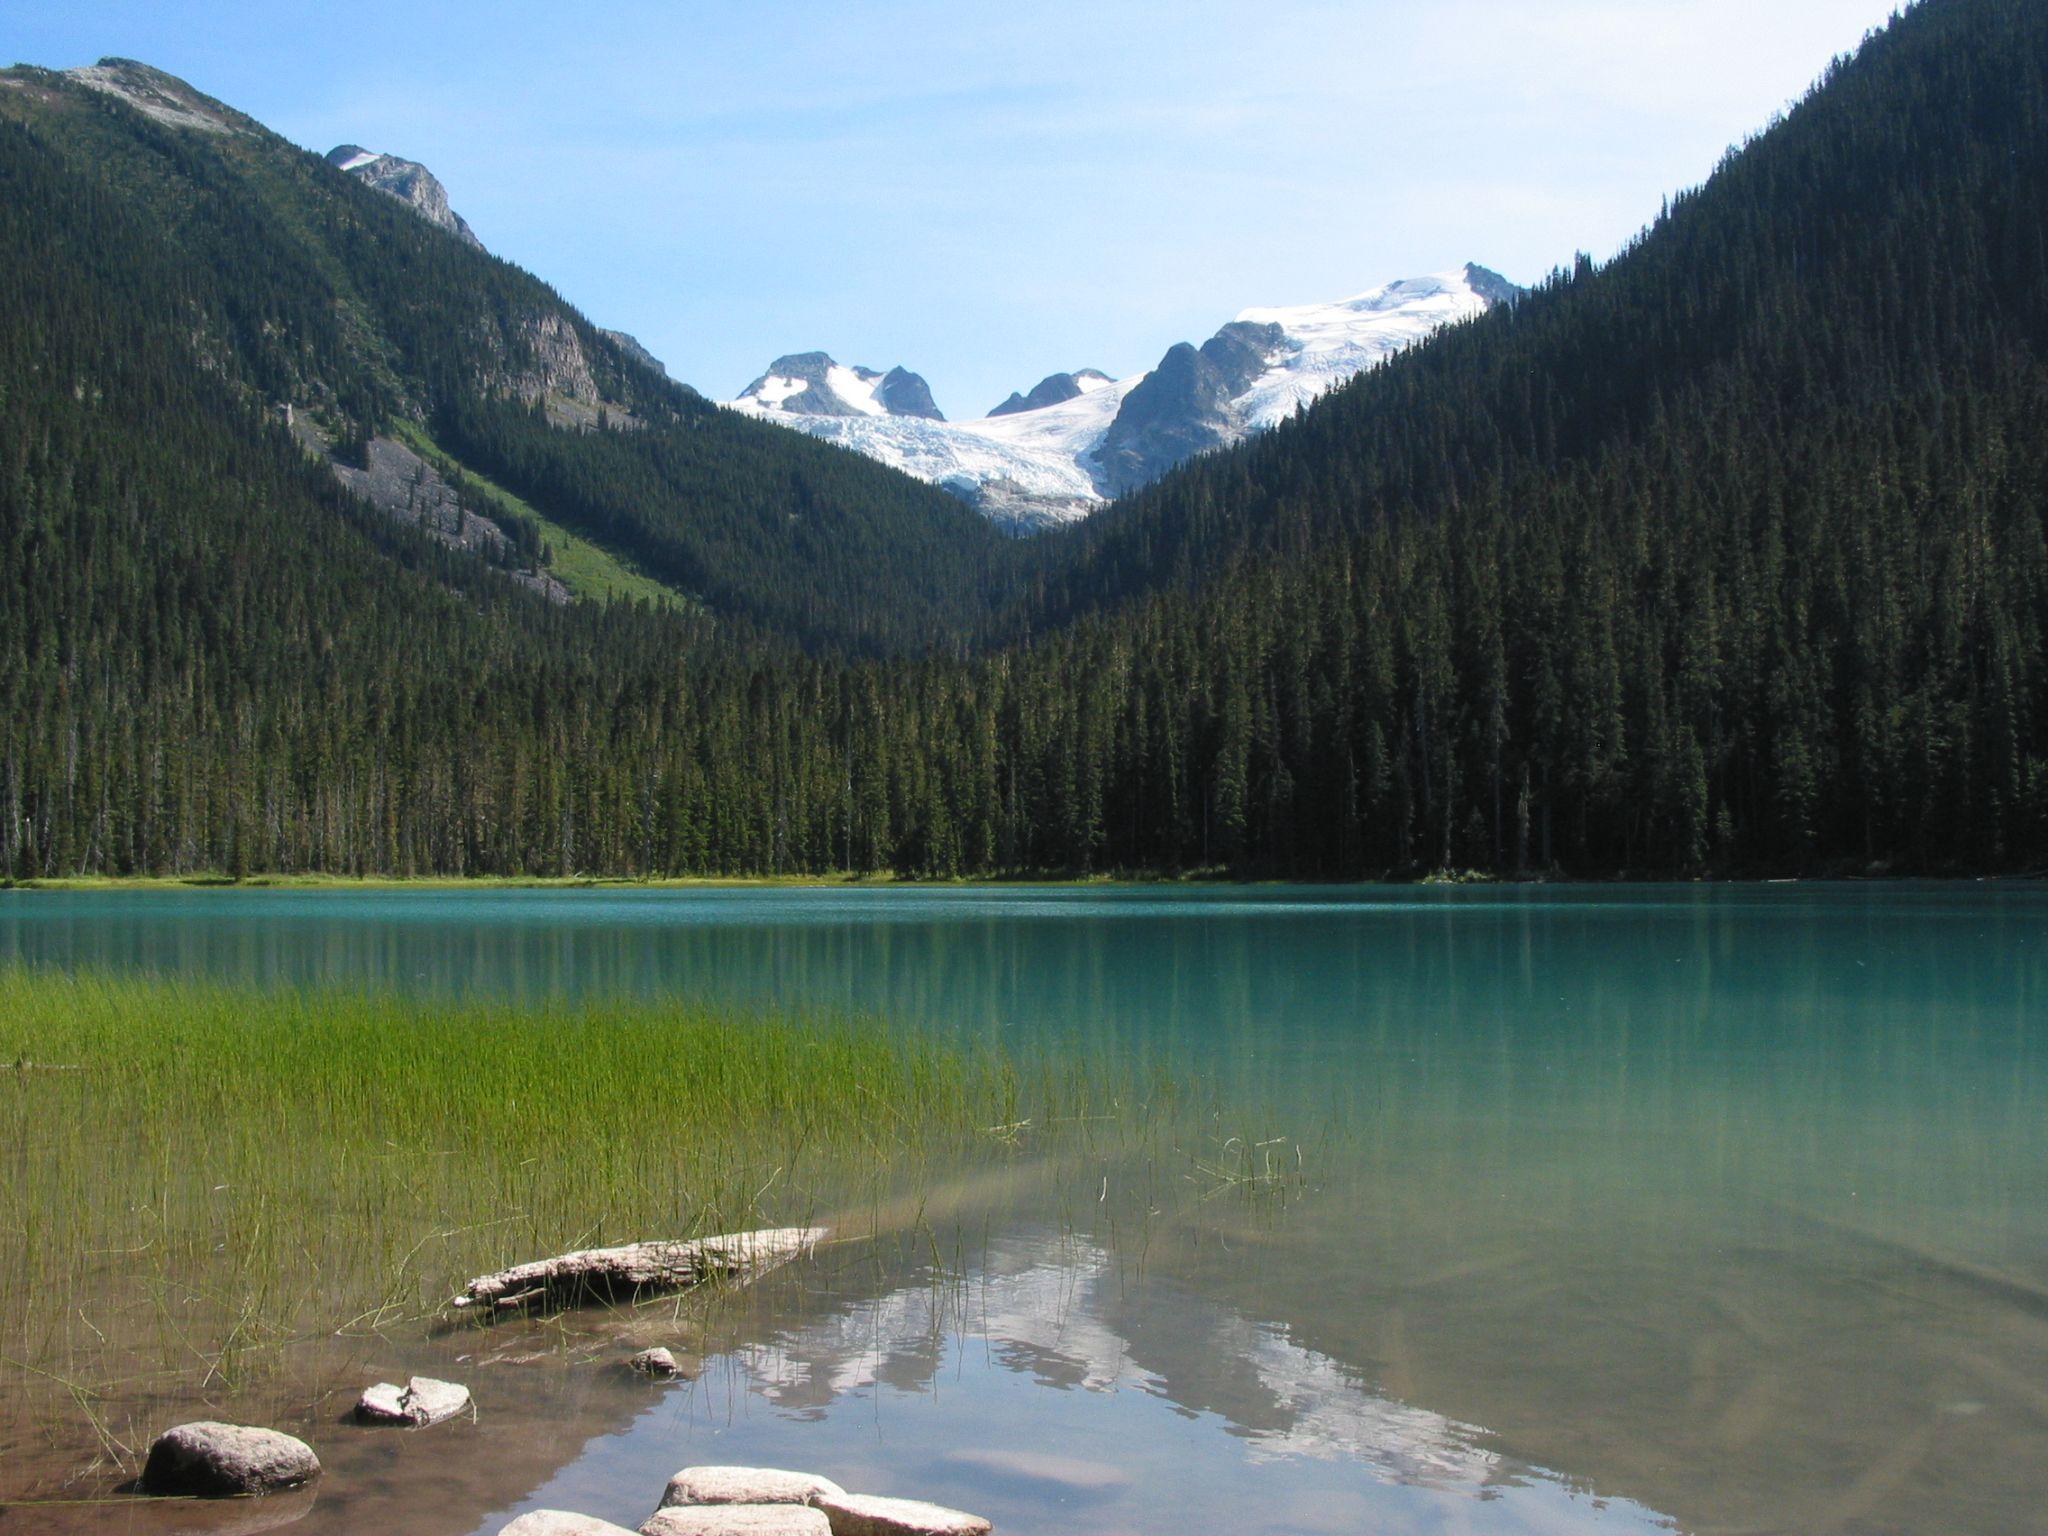 Lower Joffre Lake, Canada